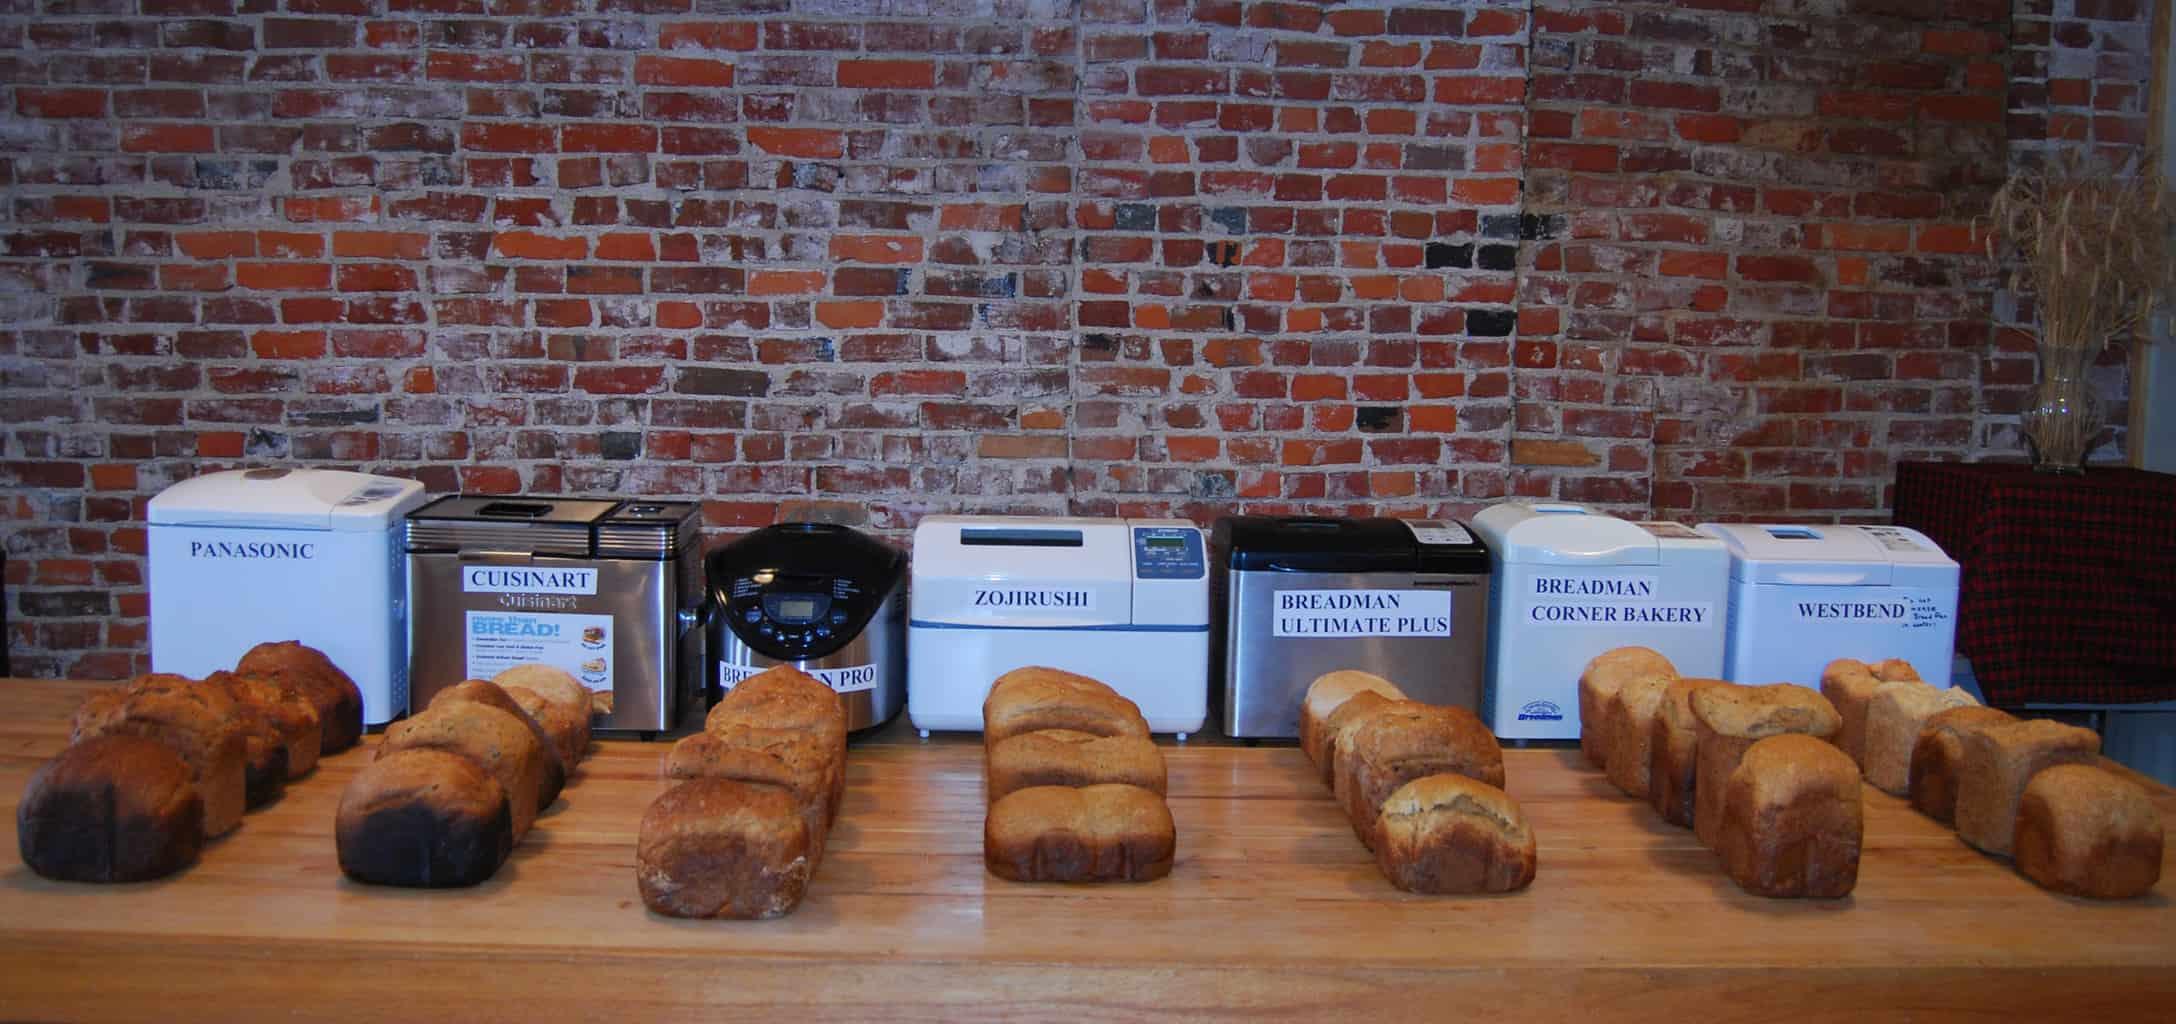 all-bread-machines-2